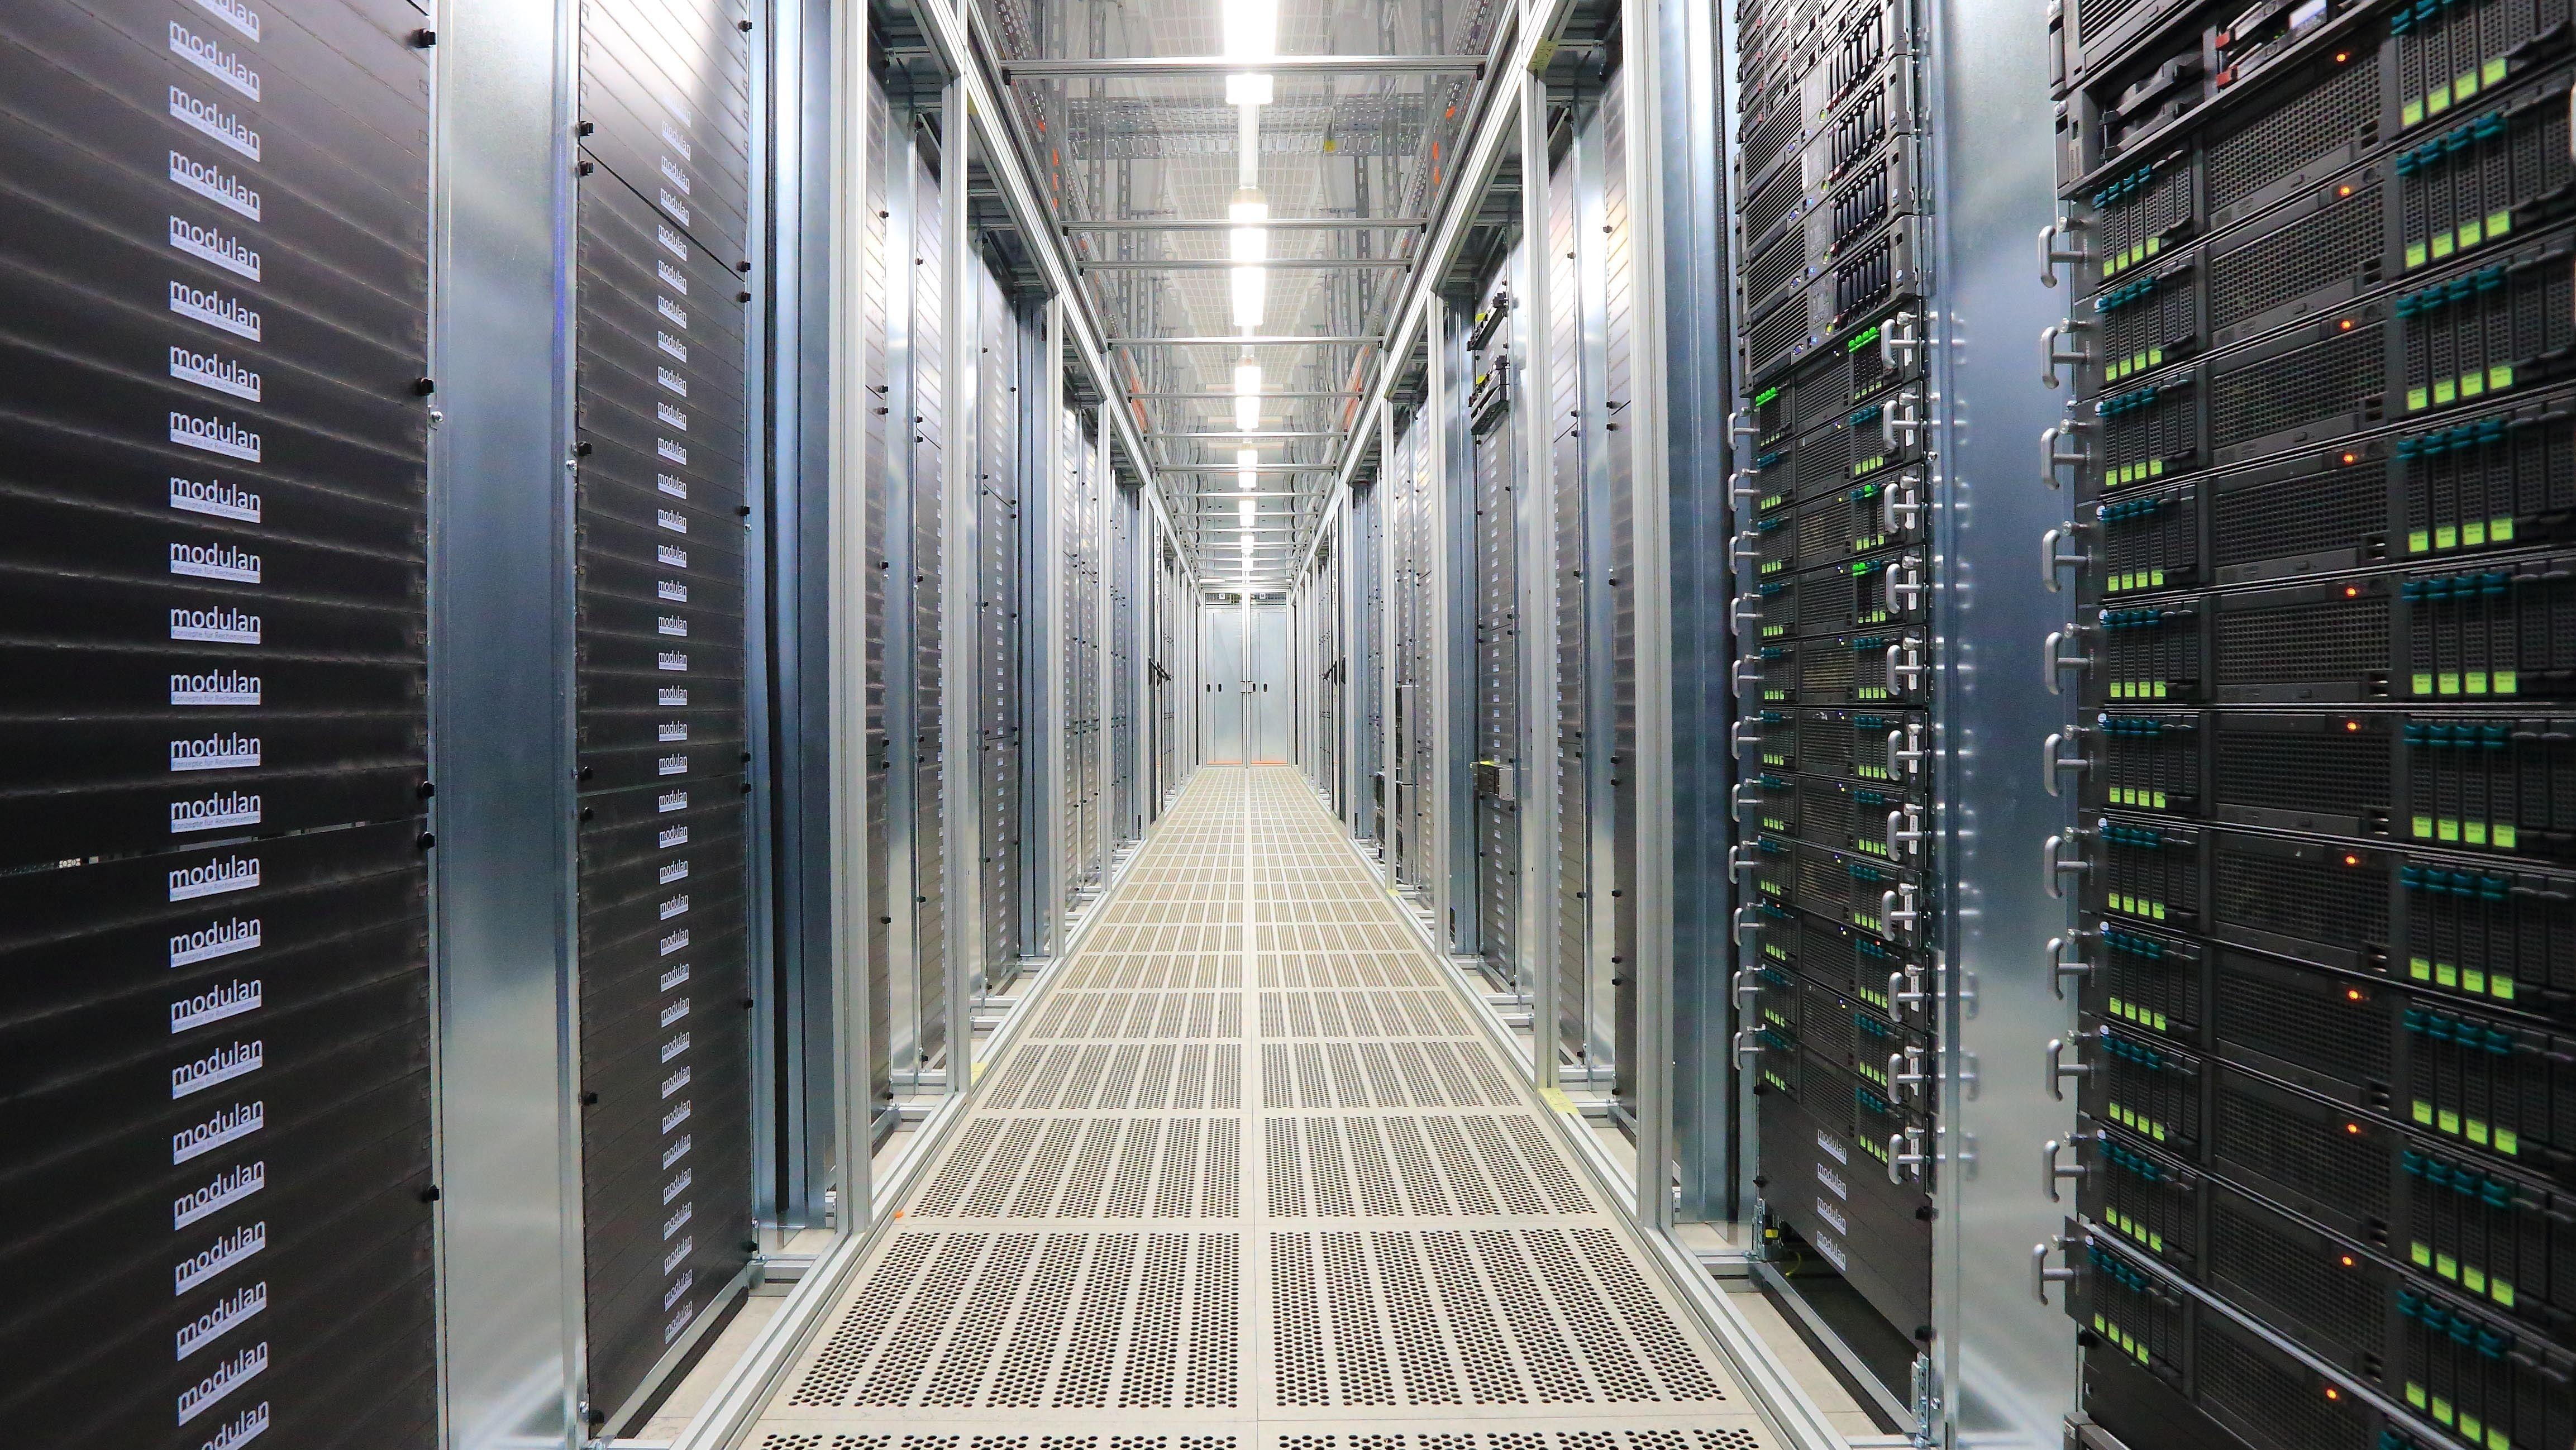 Wo liegen unsere Daten in der Cloud?